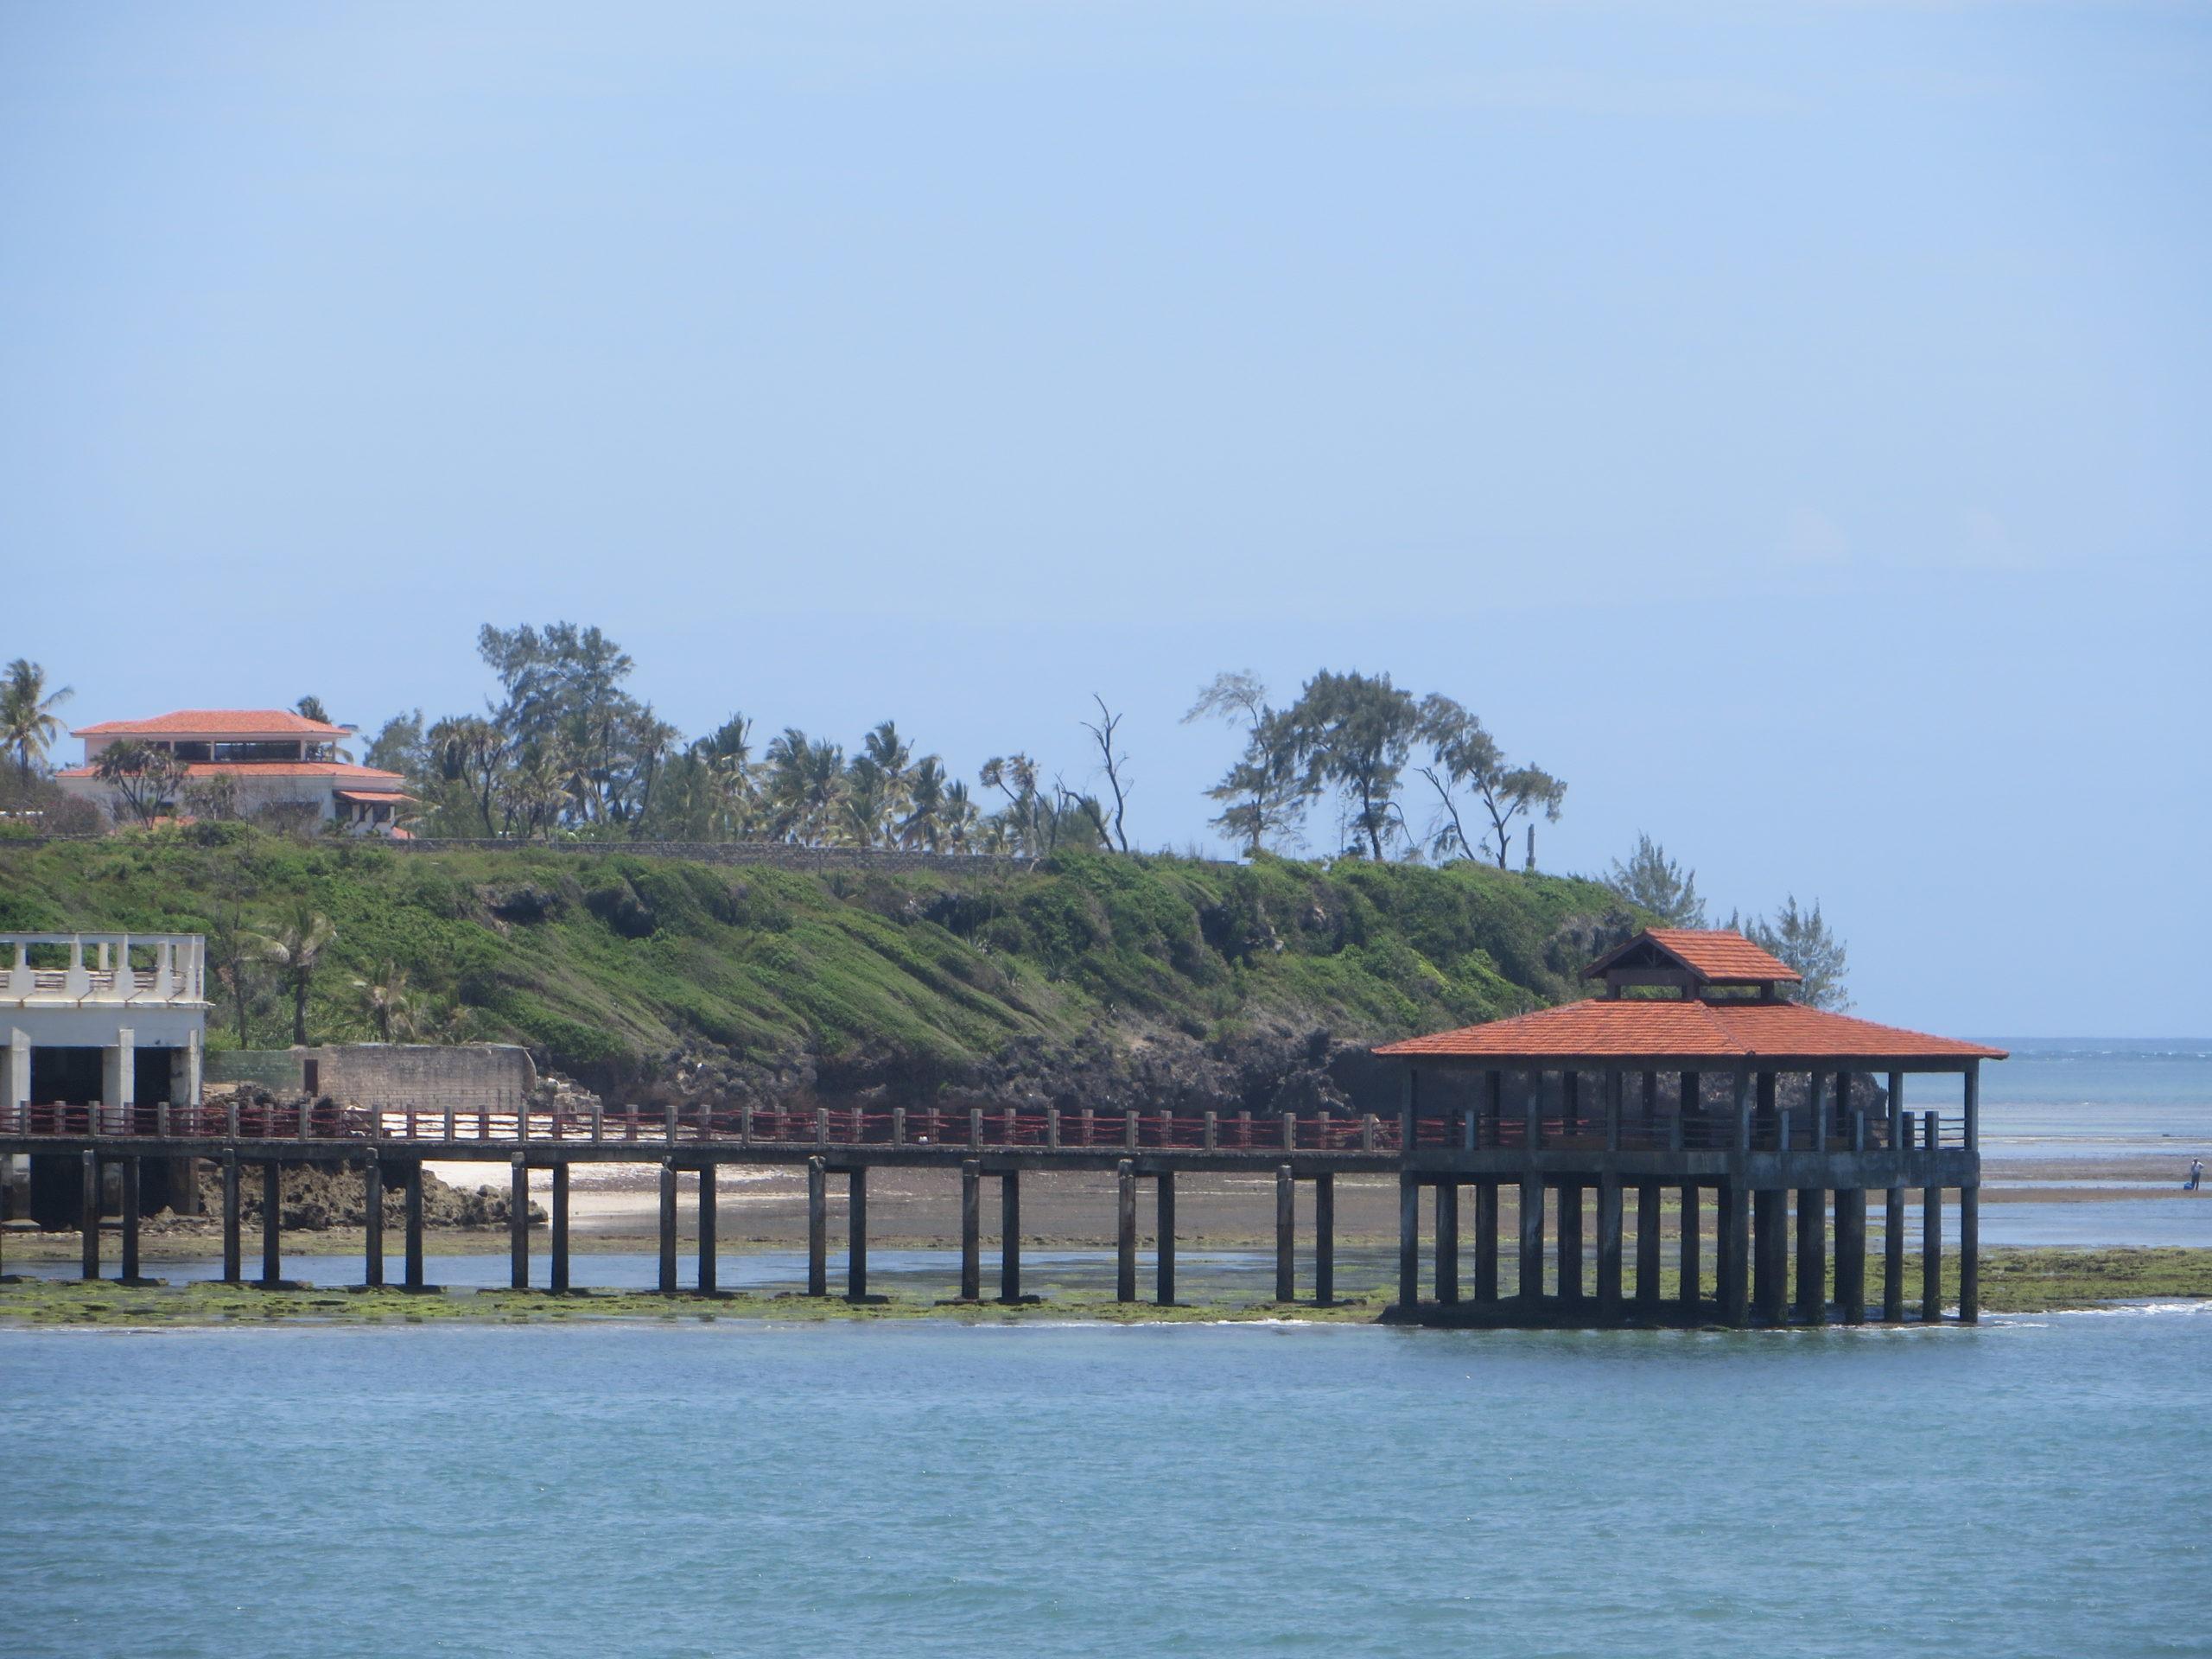 Mombasa - Harbour